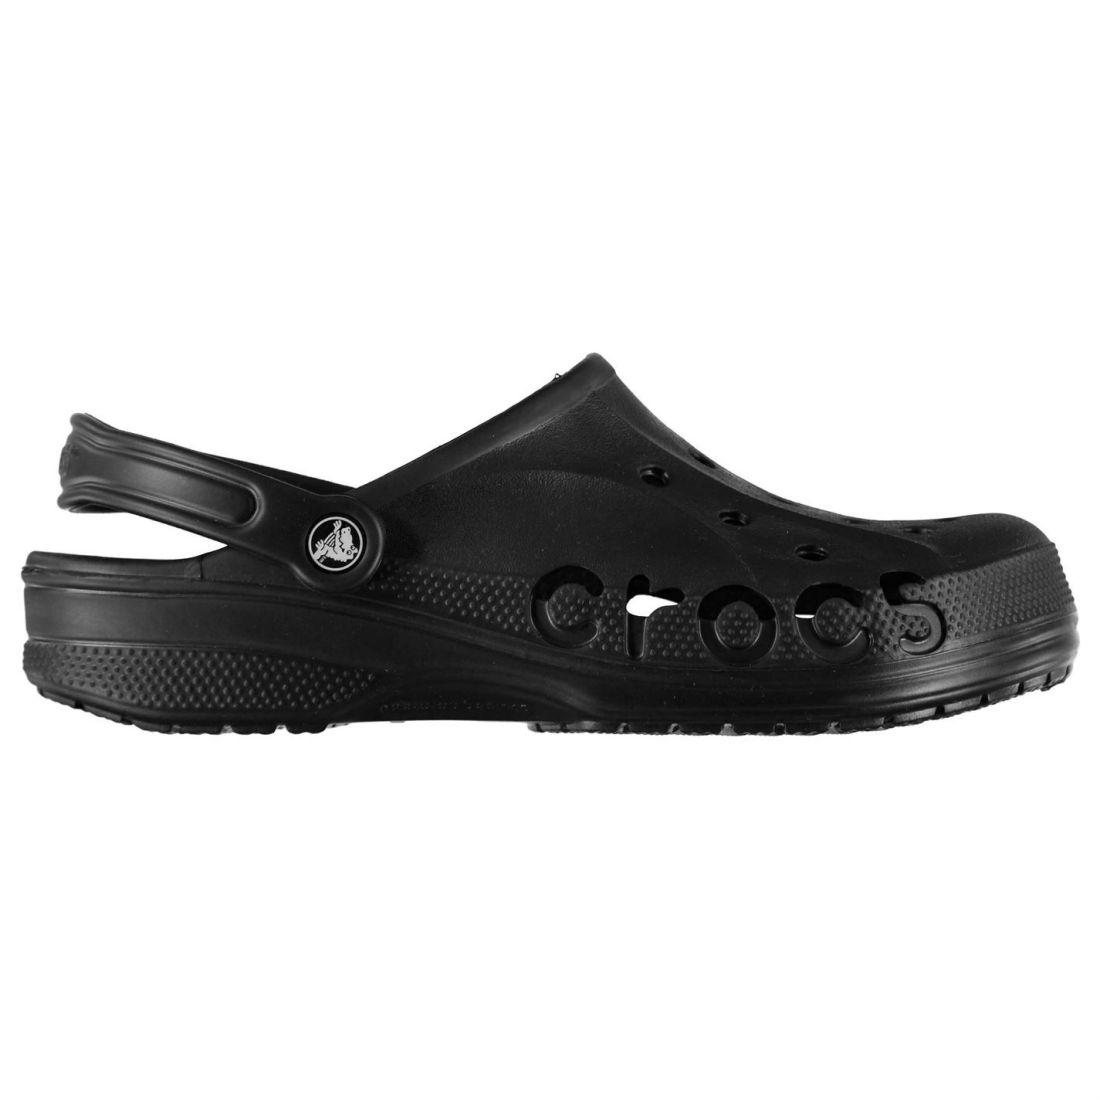 5b26223c75e6 Crocs Mens Gents Baya Clogs Shoes Garden Beach Hospital Casual ...